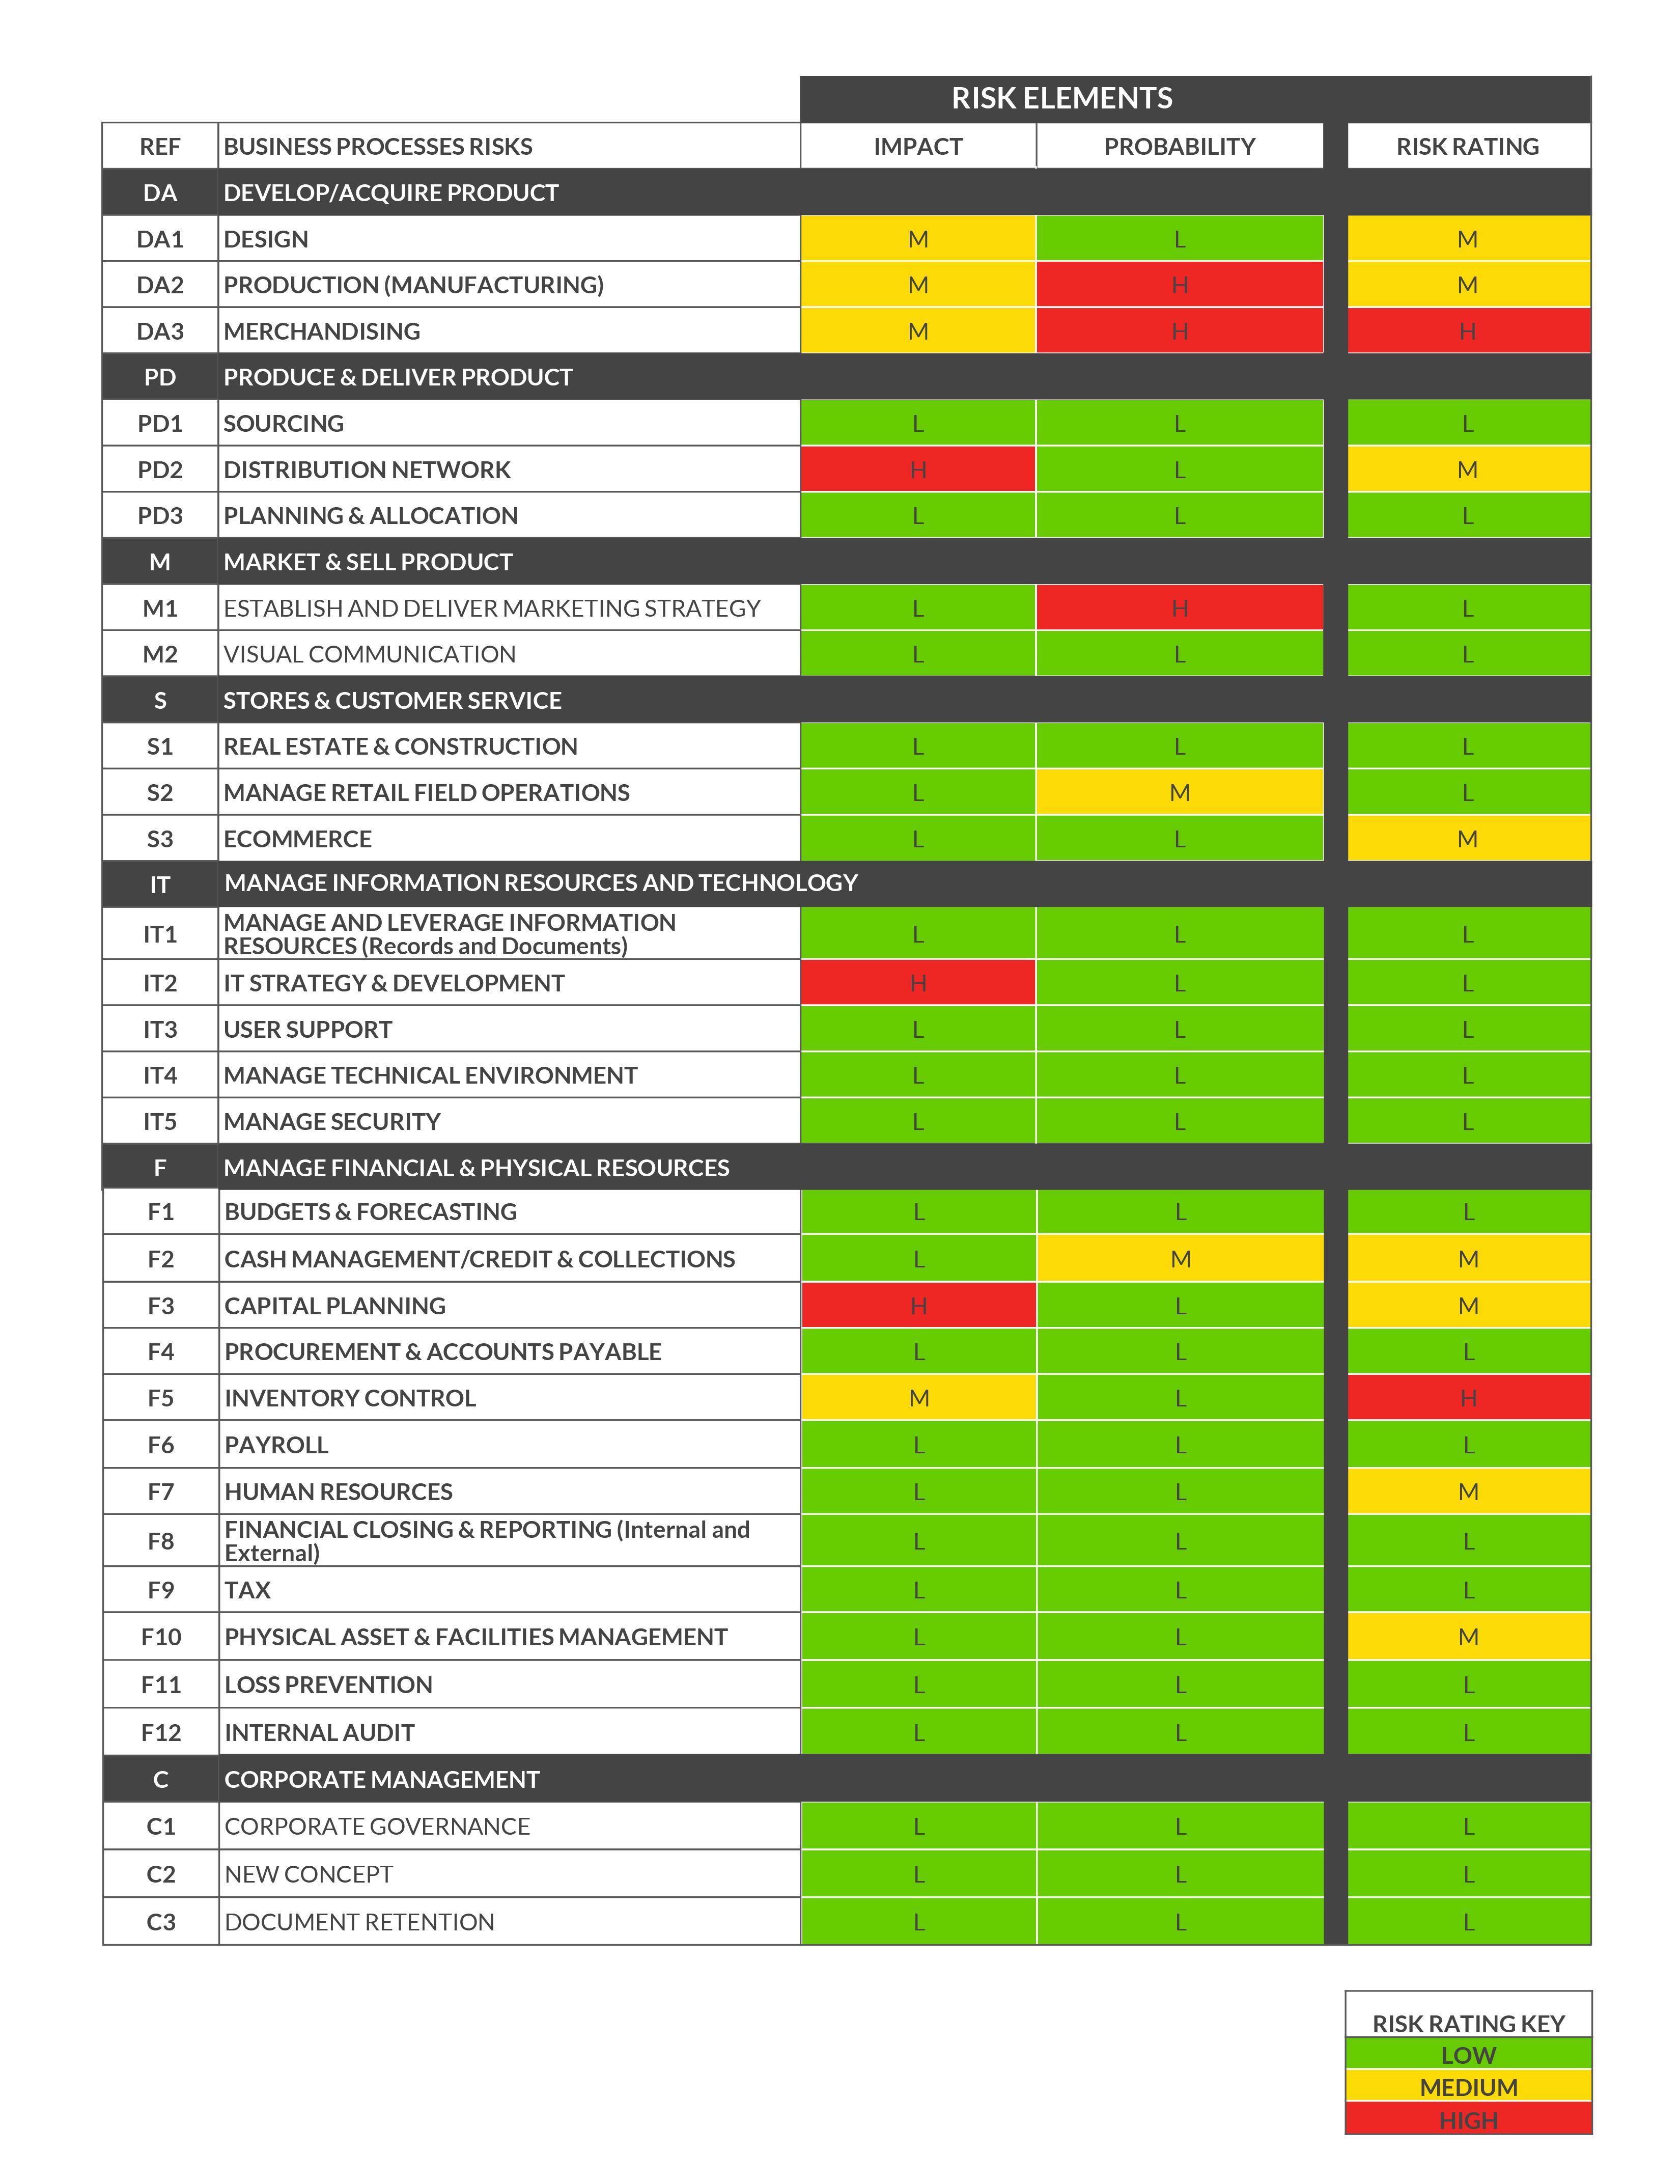 Building a risk assessment matrix | Workiva